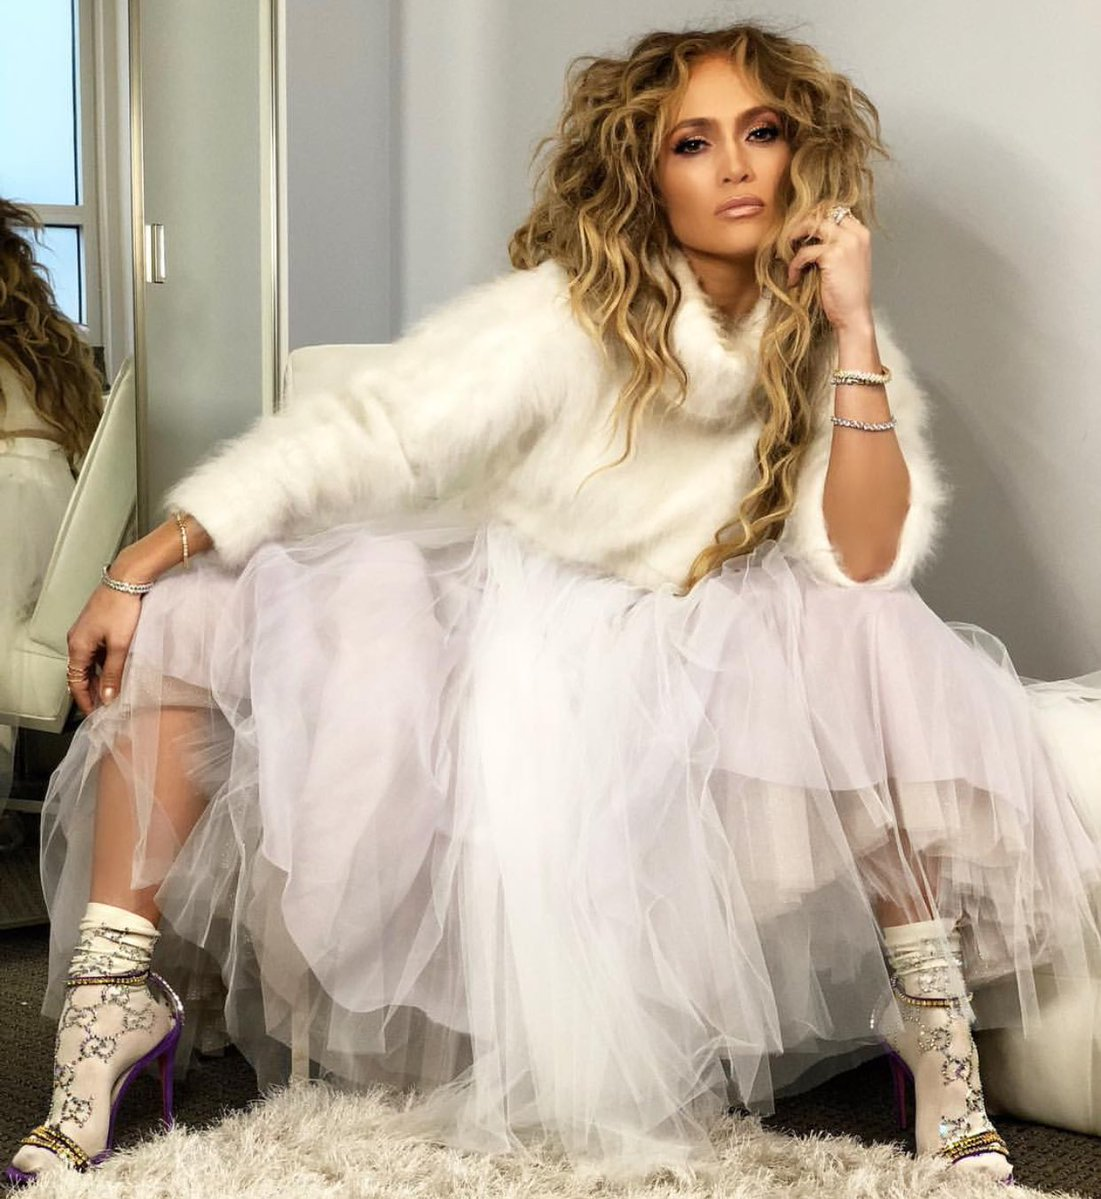 Магия от Gucci: кто из звезд готов отдать 75,000 за пару носков?